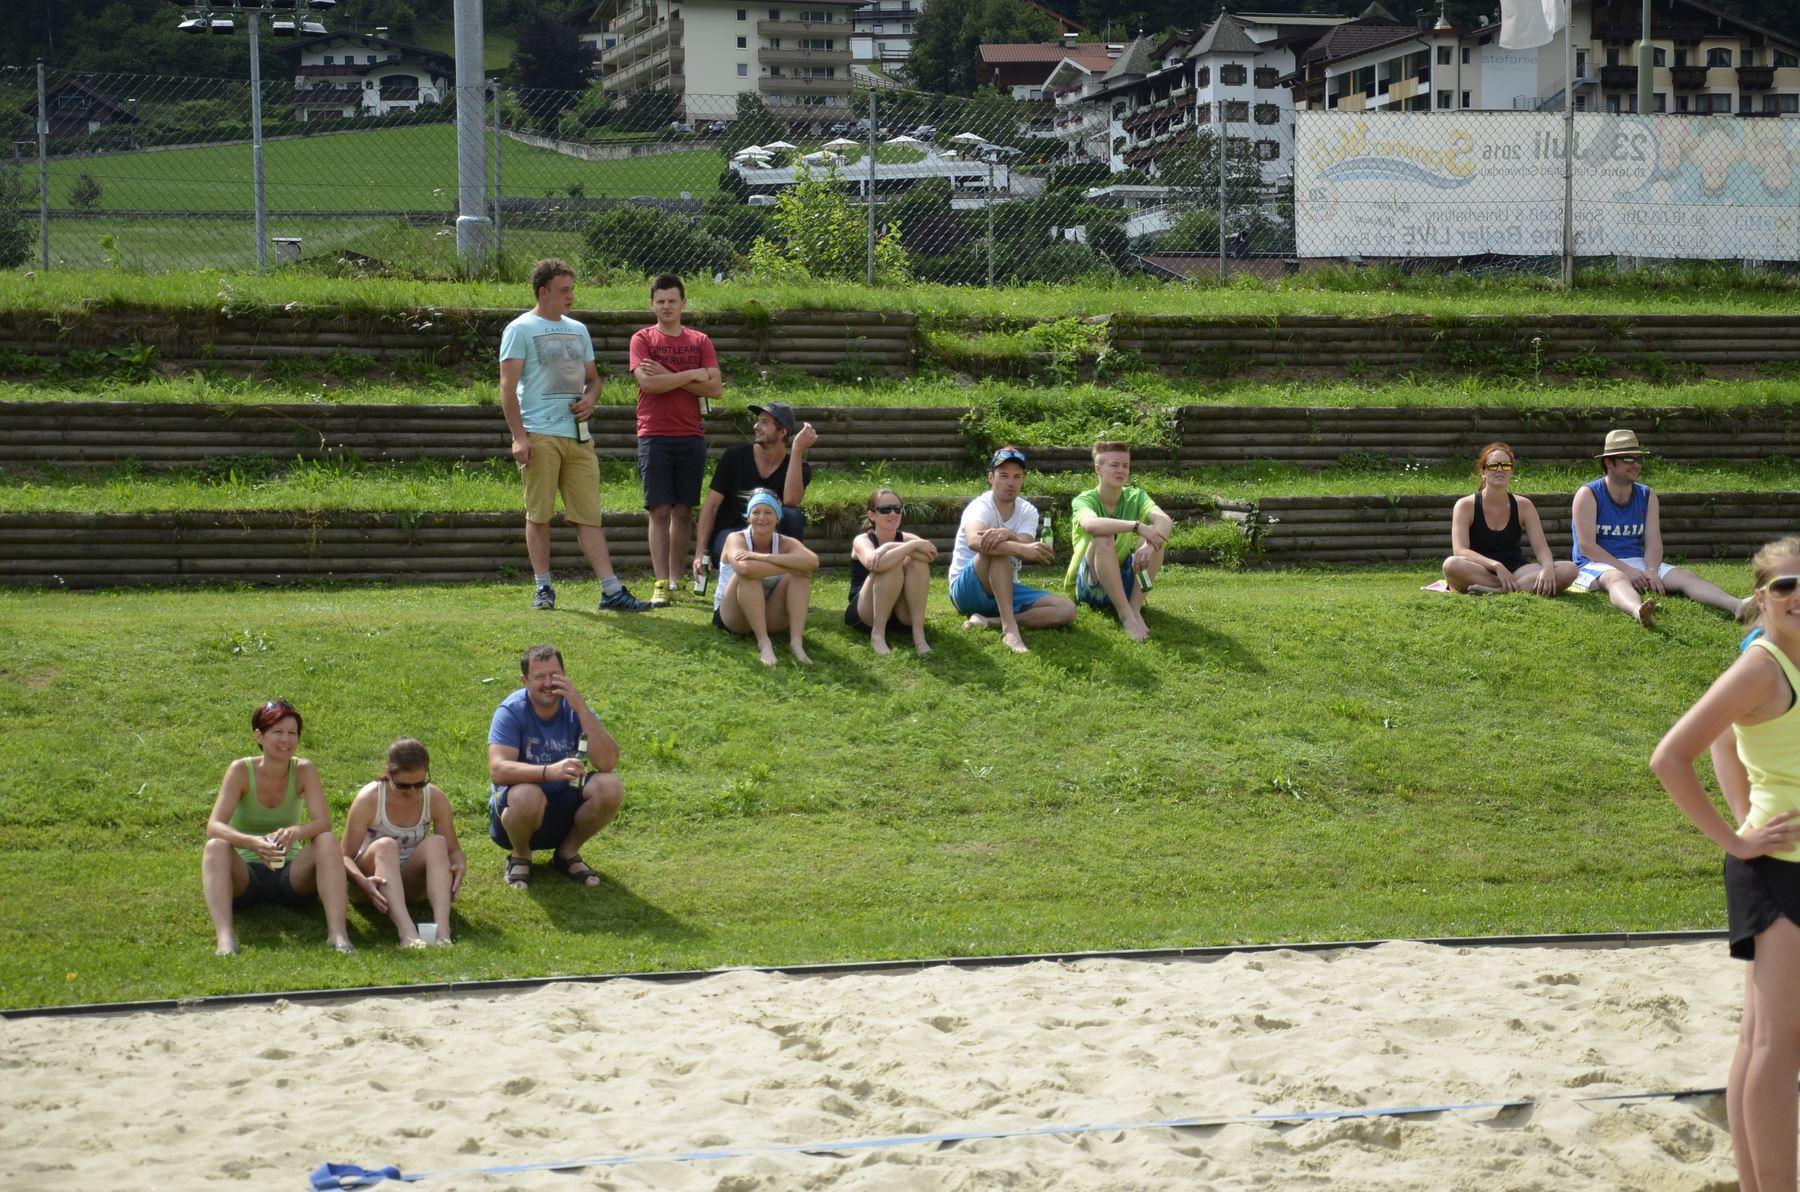 2016-07-02 Beachvolleyball 215